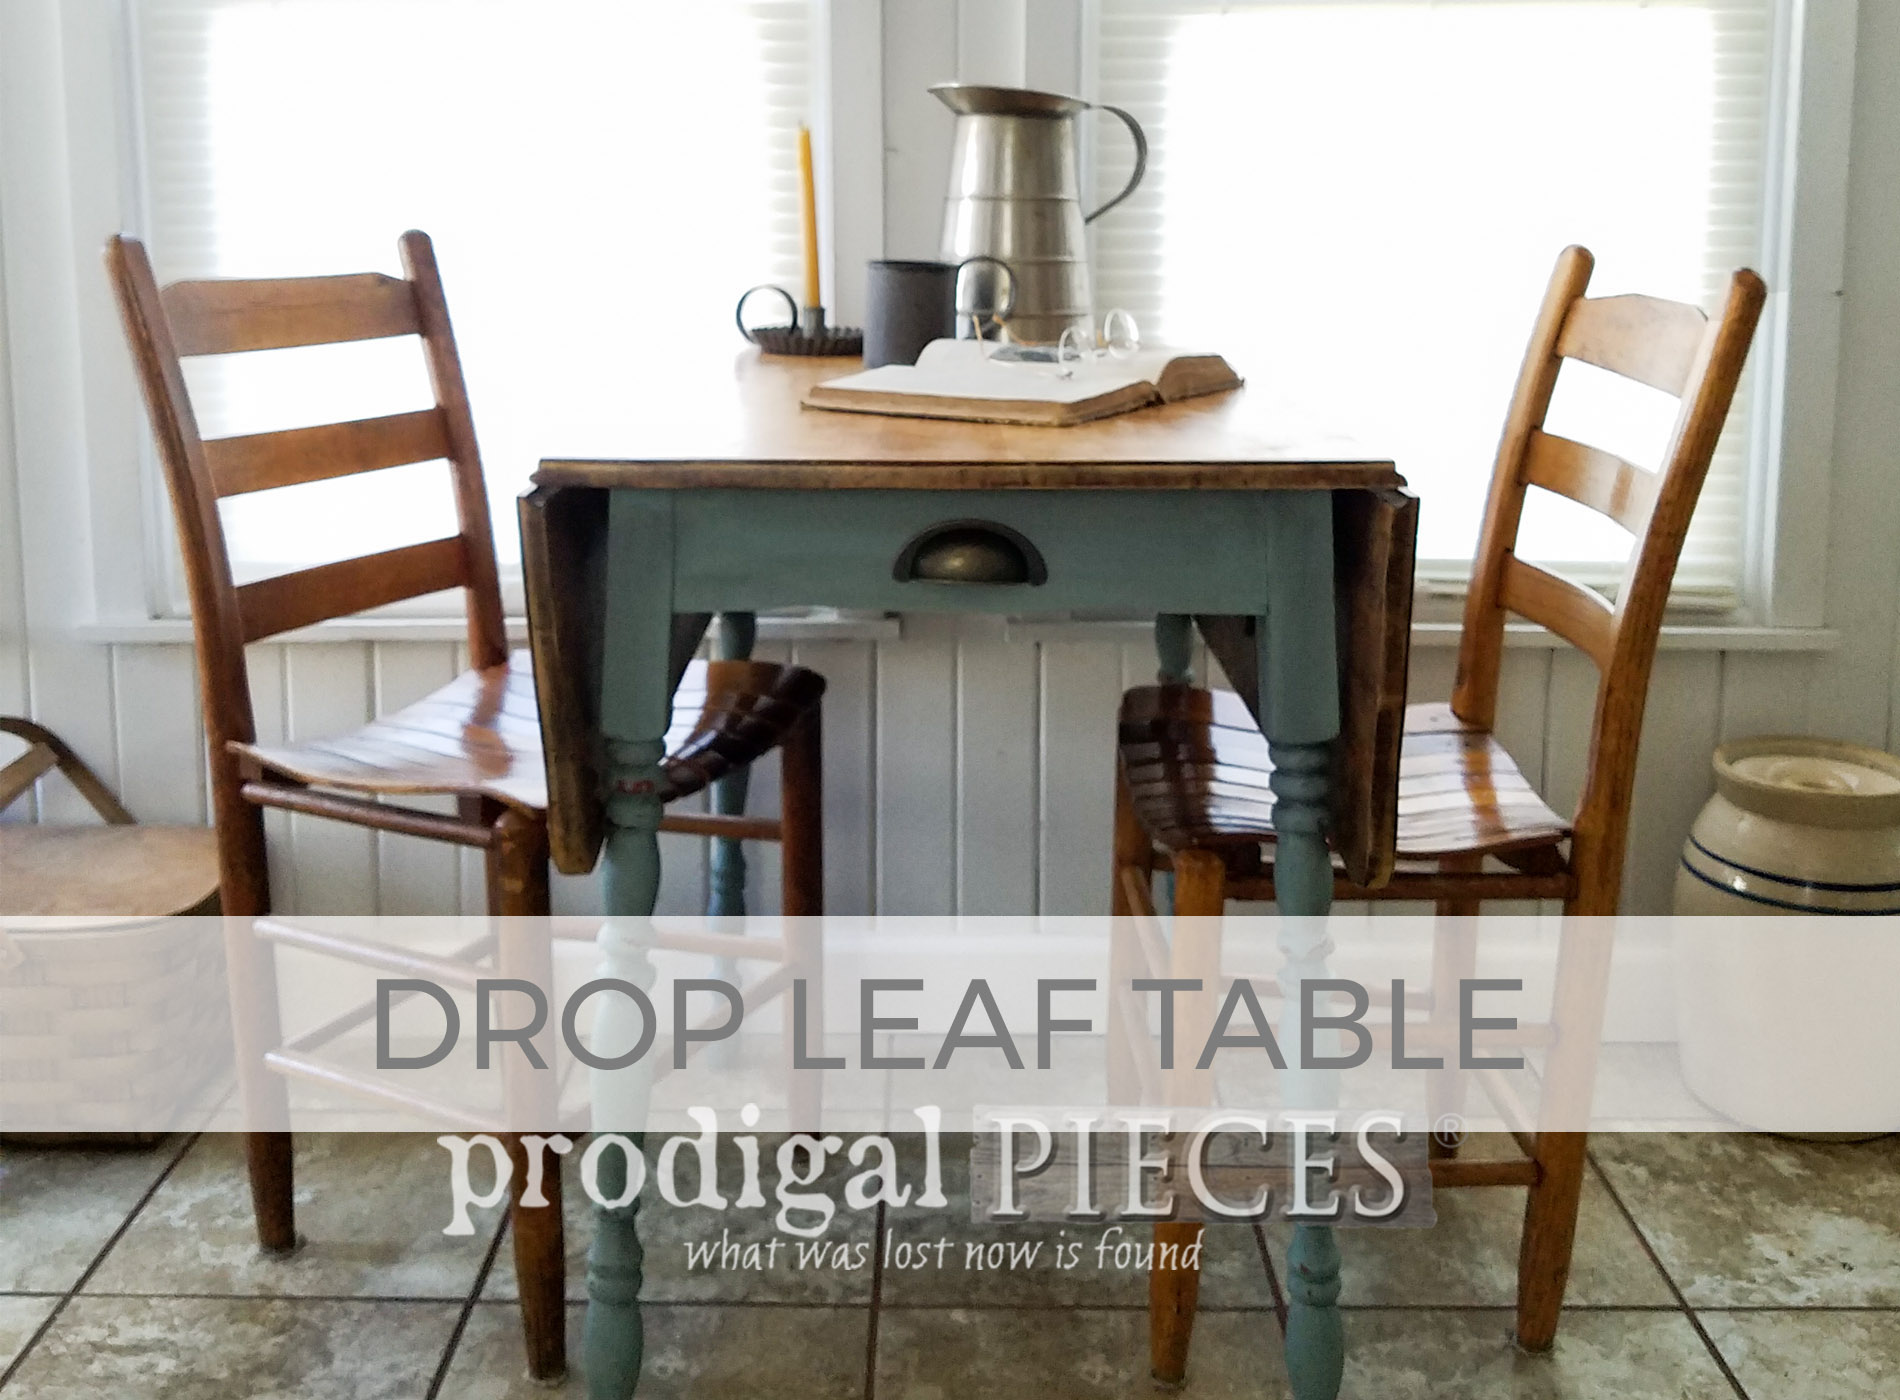 Vintage Drop Leaf Table by Larissa of Prodigal Pieces | prodigalpieces.com